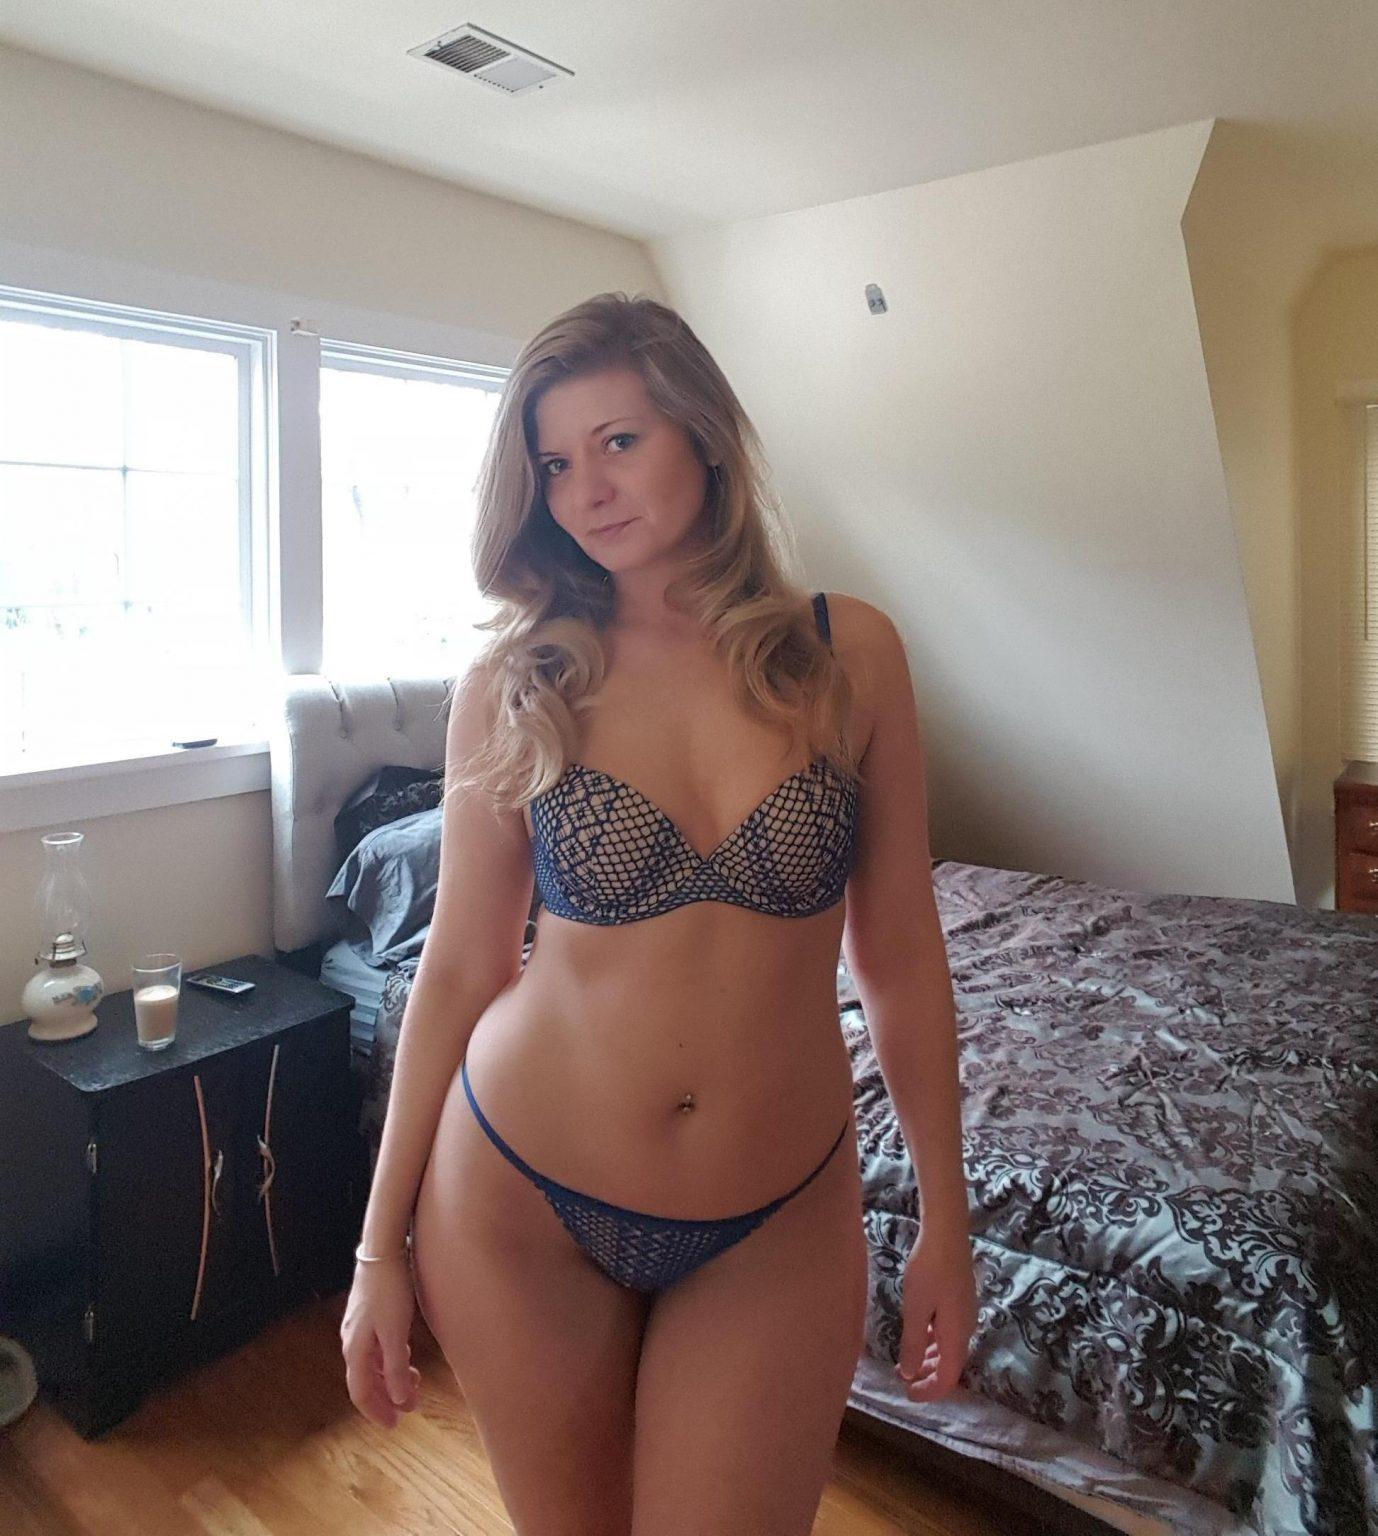 Nude underwear Milfs pics! Naked Mature & Cougar Selfies